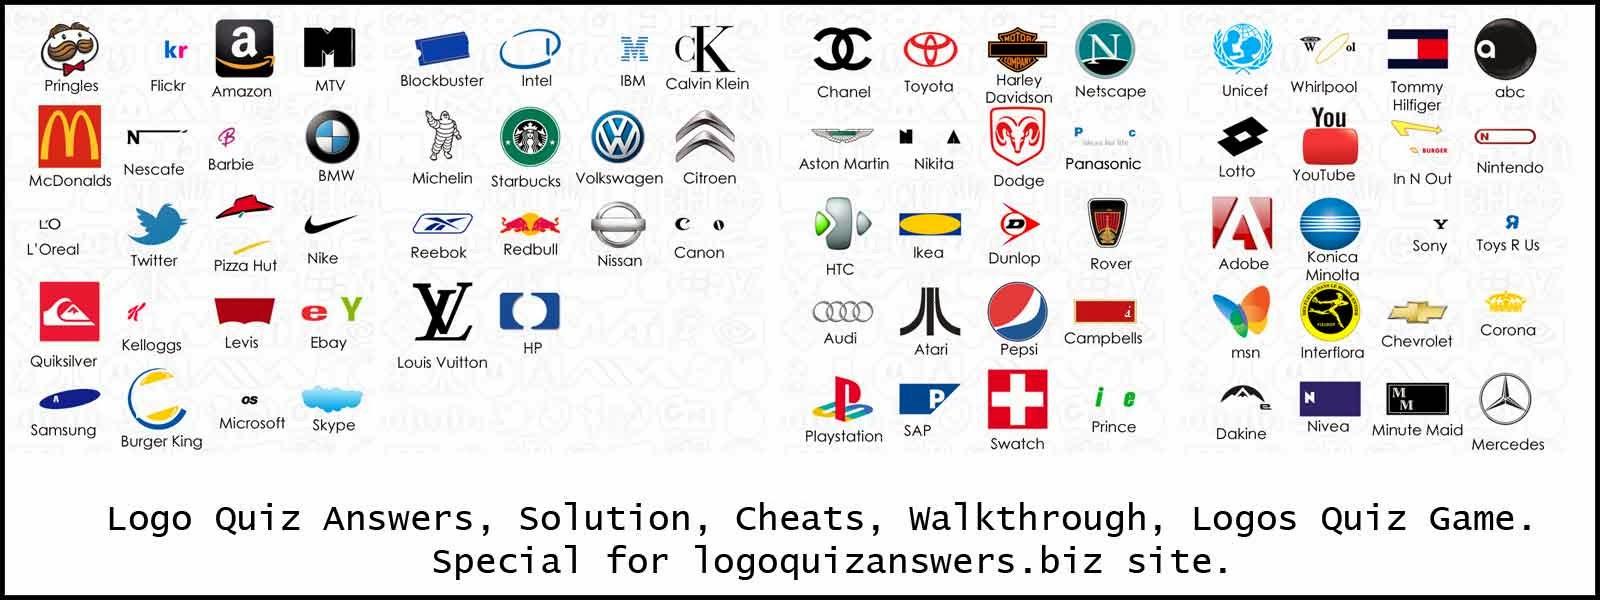 Connu 3D Logo Quiz Game Answers | Logo Wallpaper RK75